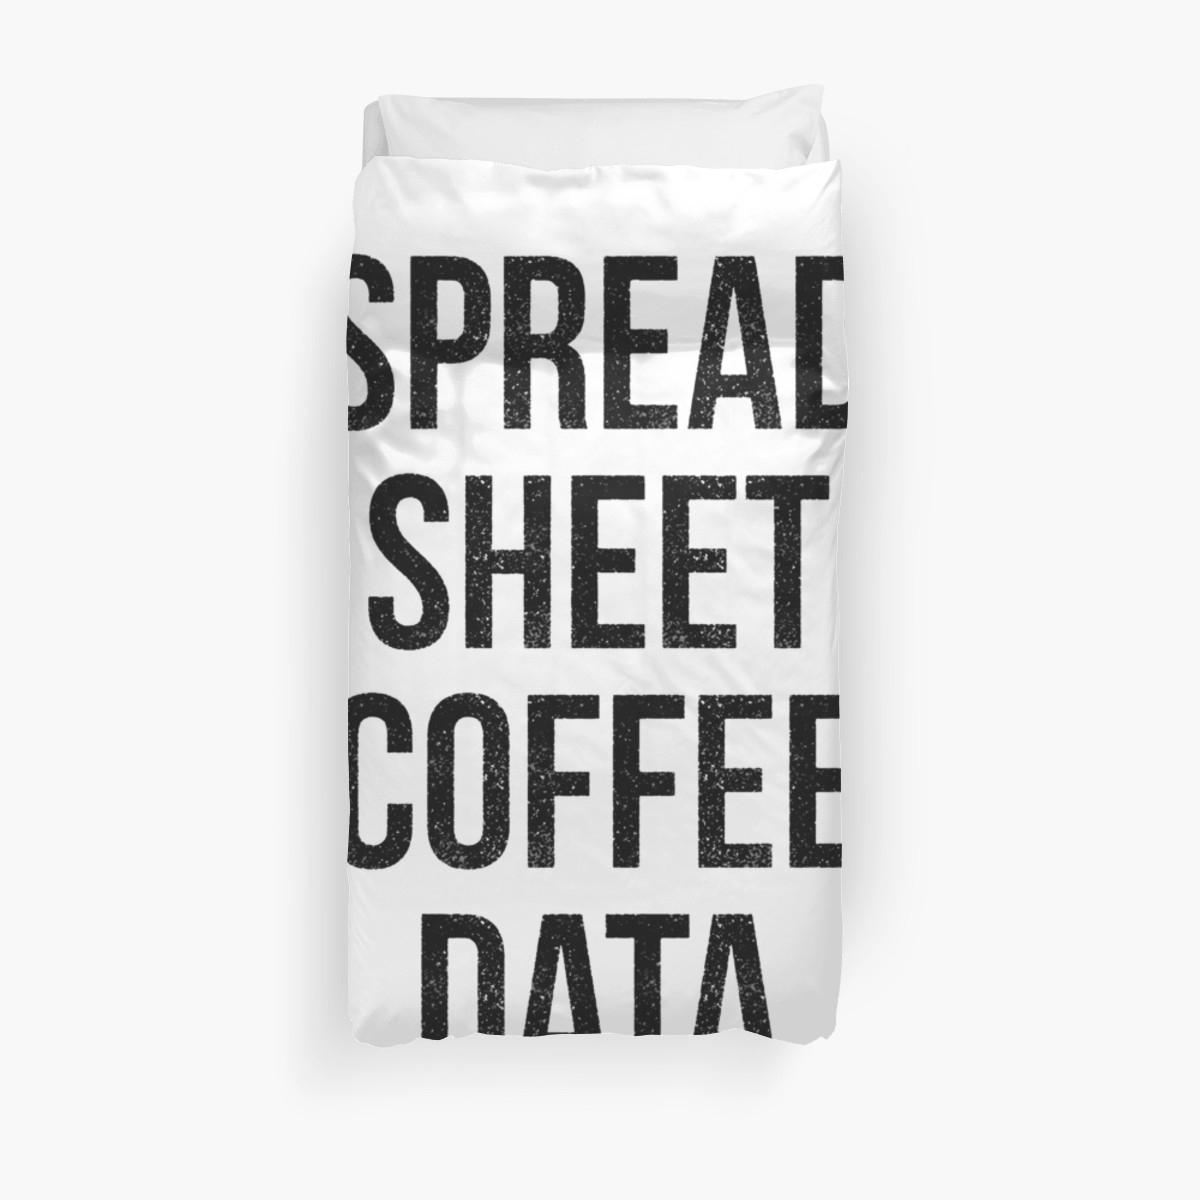 "Spreadsheet Duvet Cover Pertaining To Spreadsheet Coffee Data"" Duvet Coverscurtis Cunningham  Redbubble"